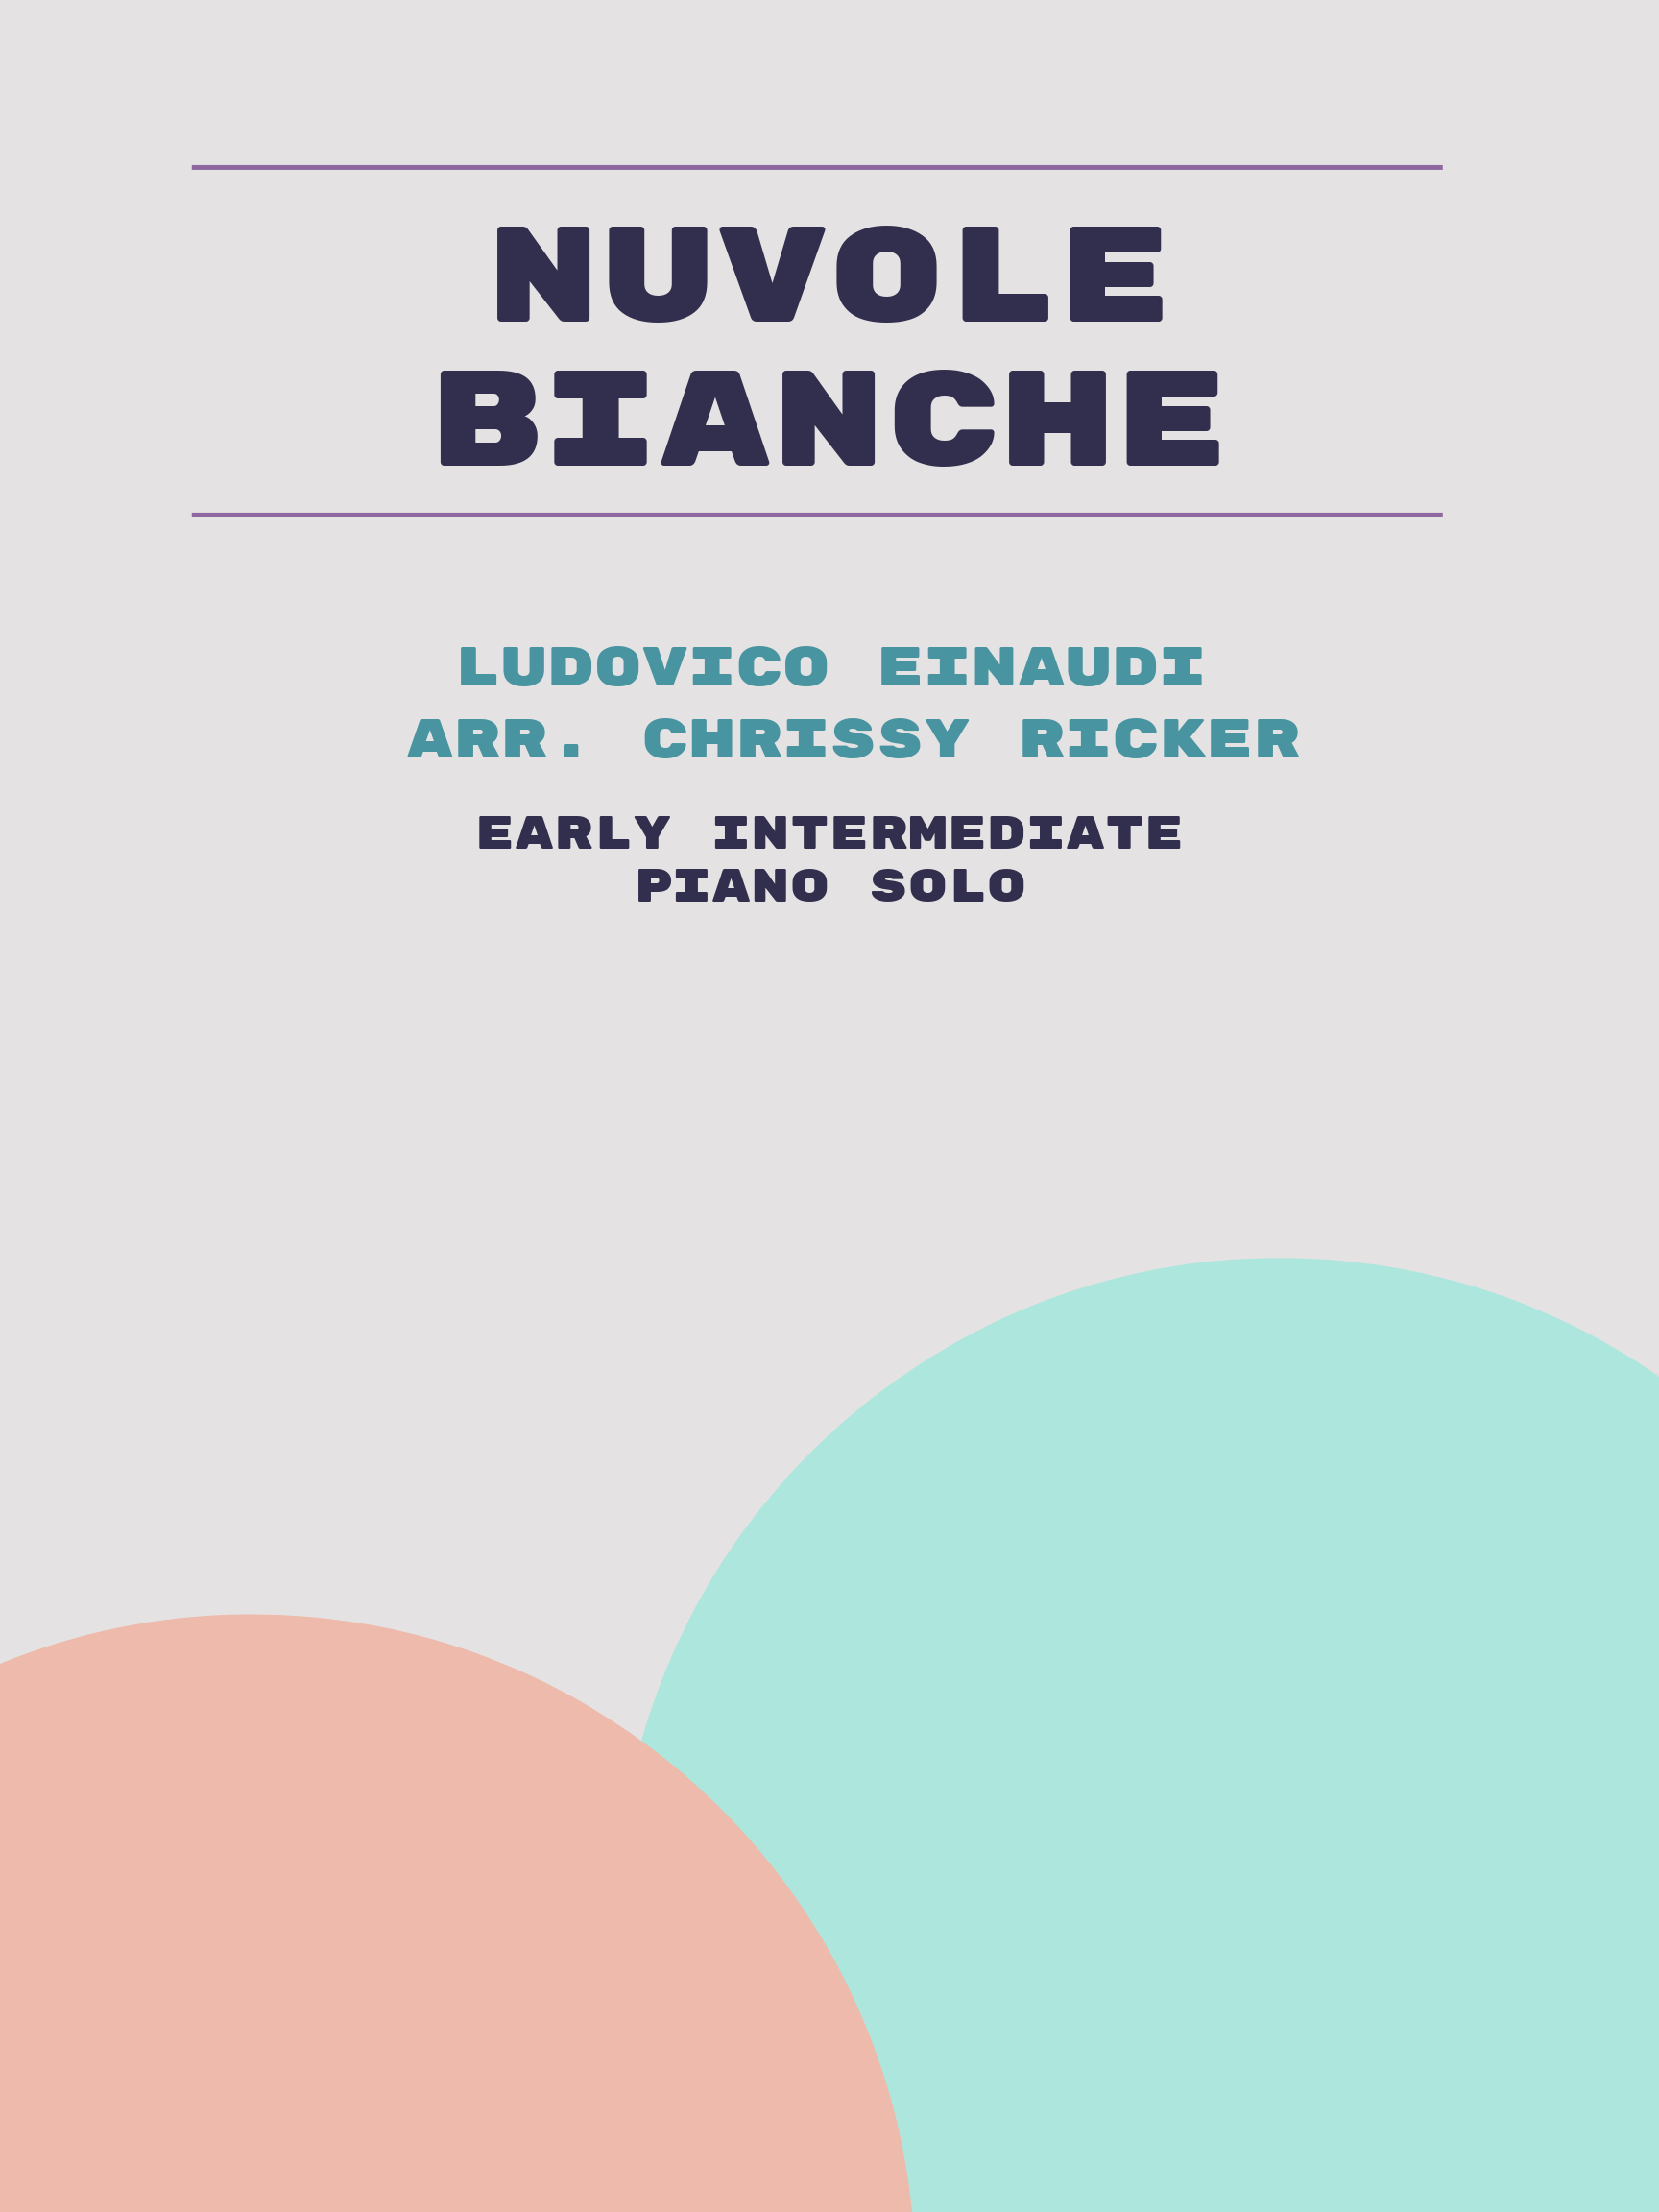 Nuvole Bianche by Ludovico Einaudi